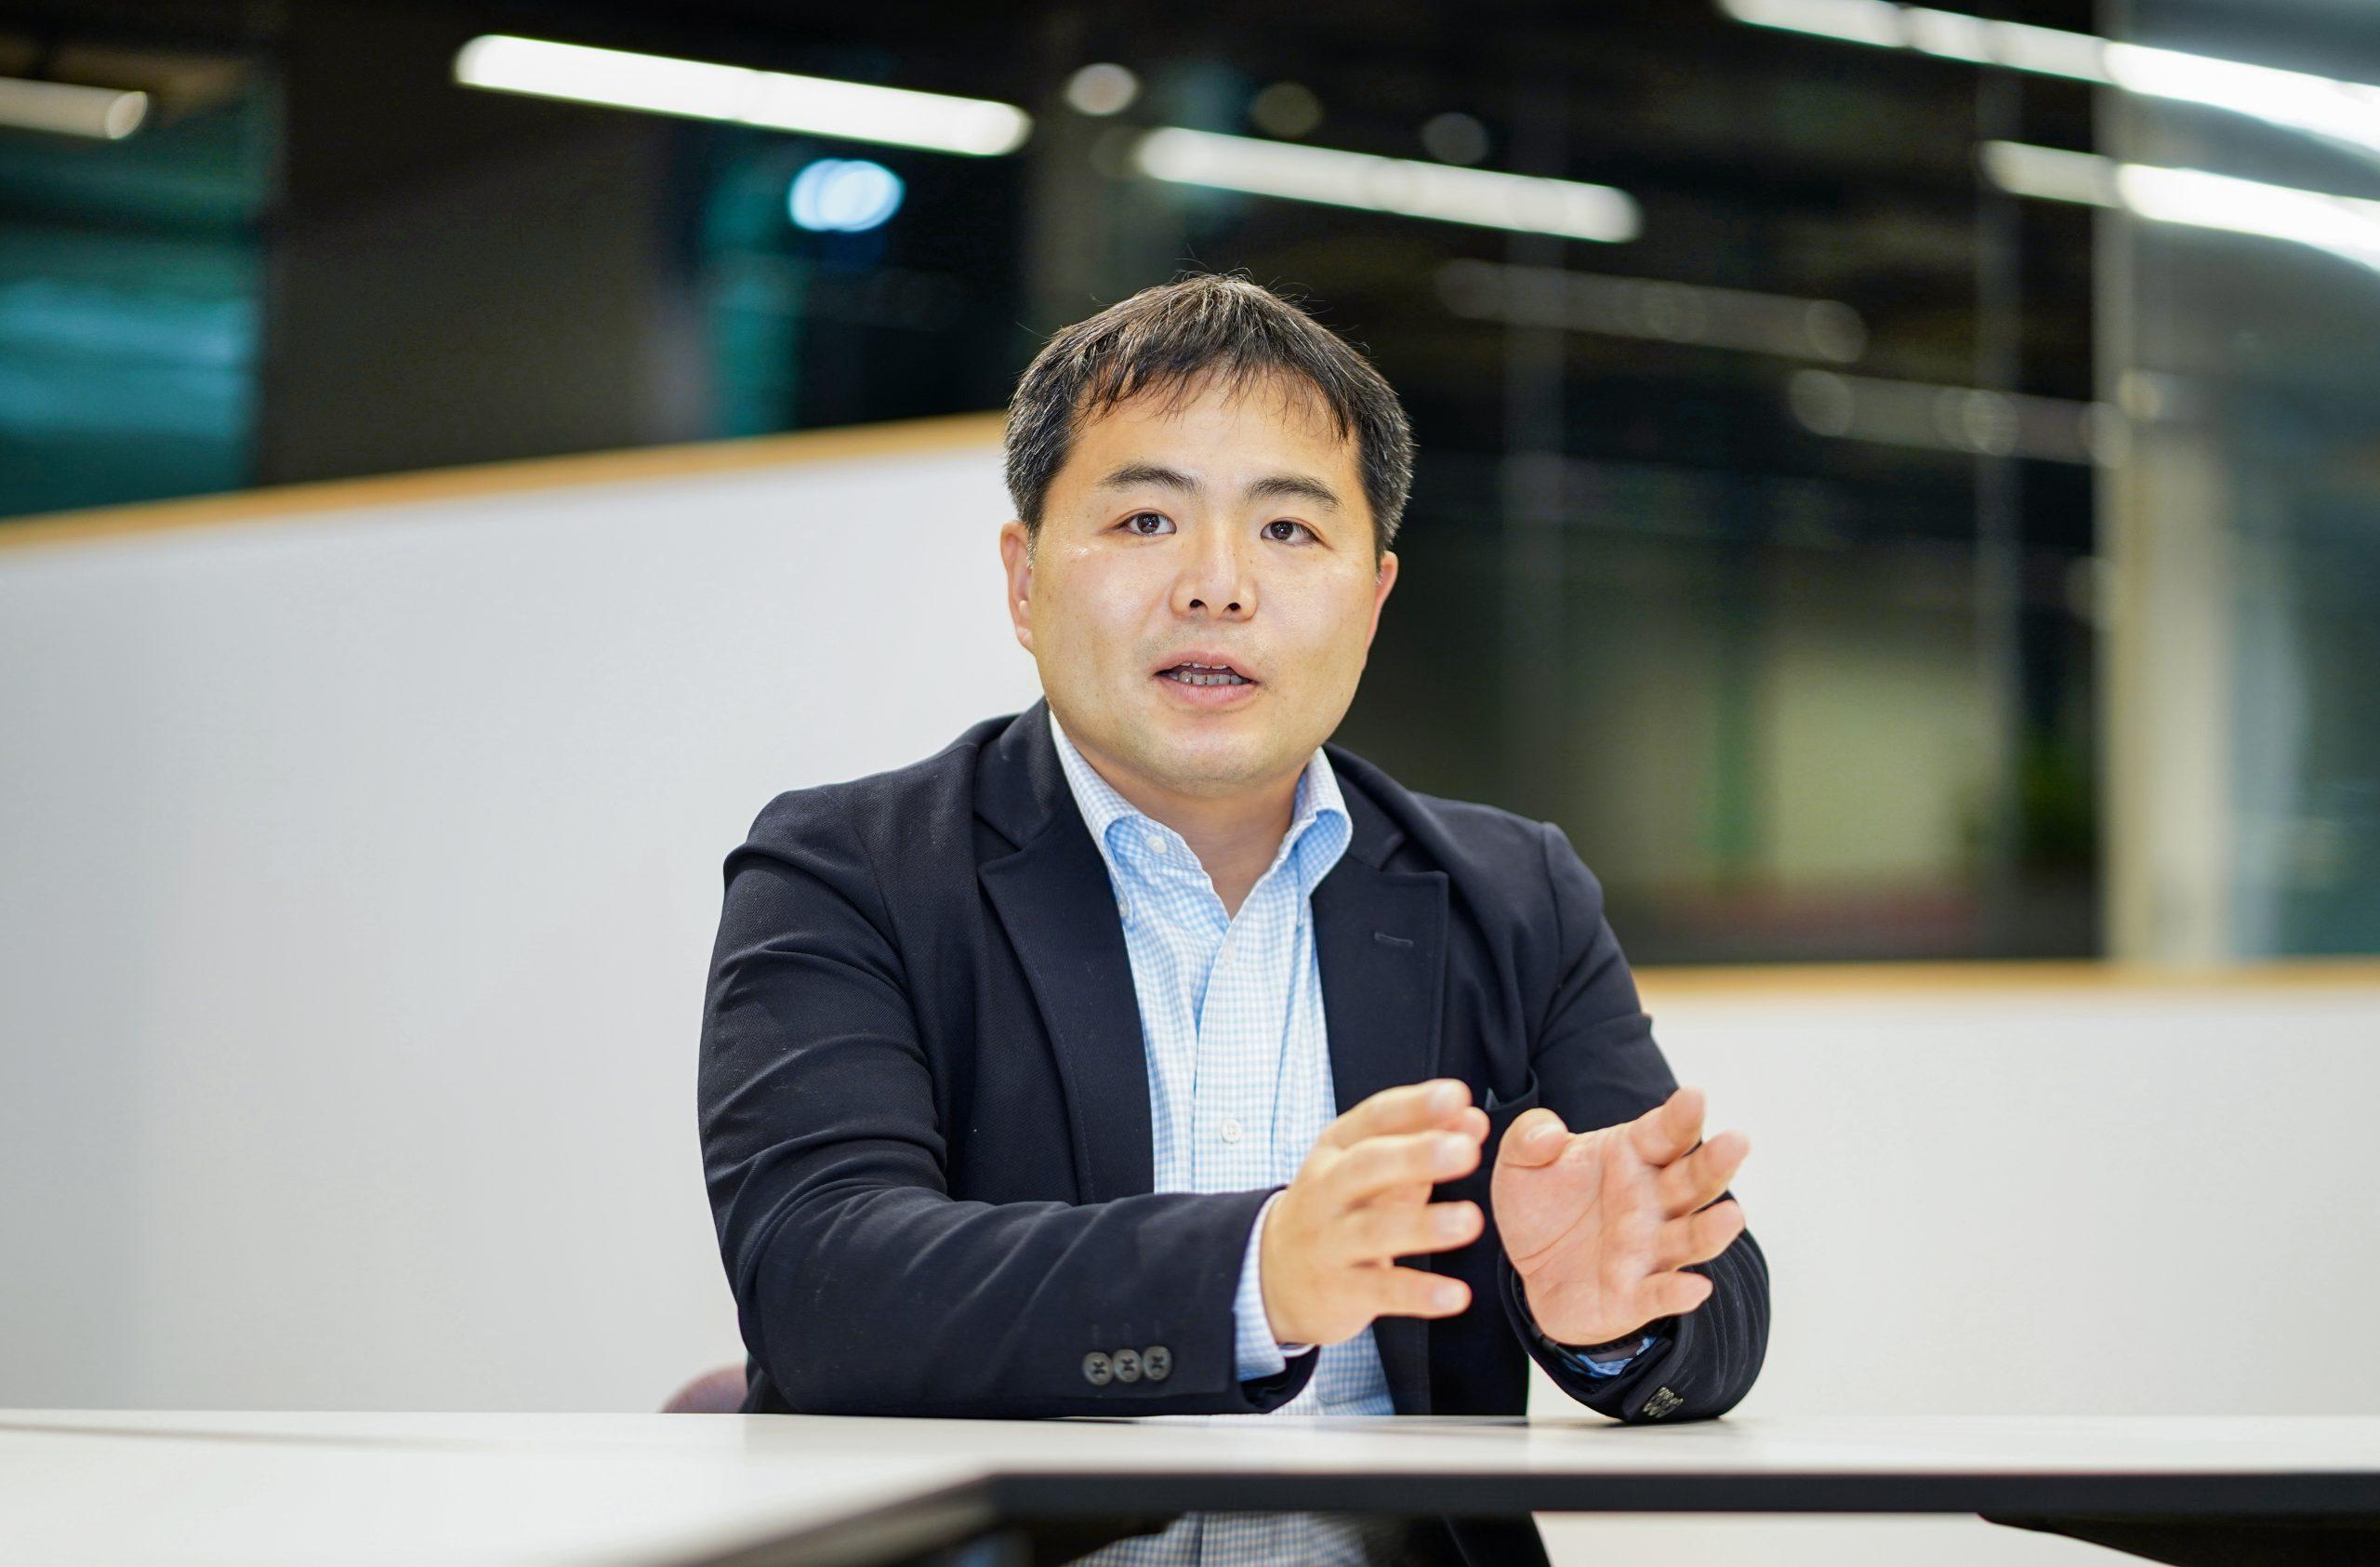 株式会社東芝 CPS×デザイン部 CPS戦略室 参事 相澤 宏行氏